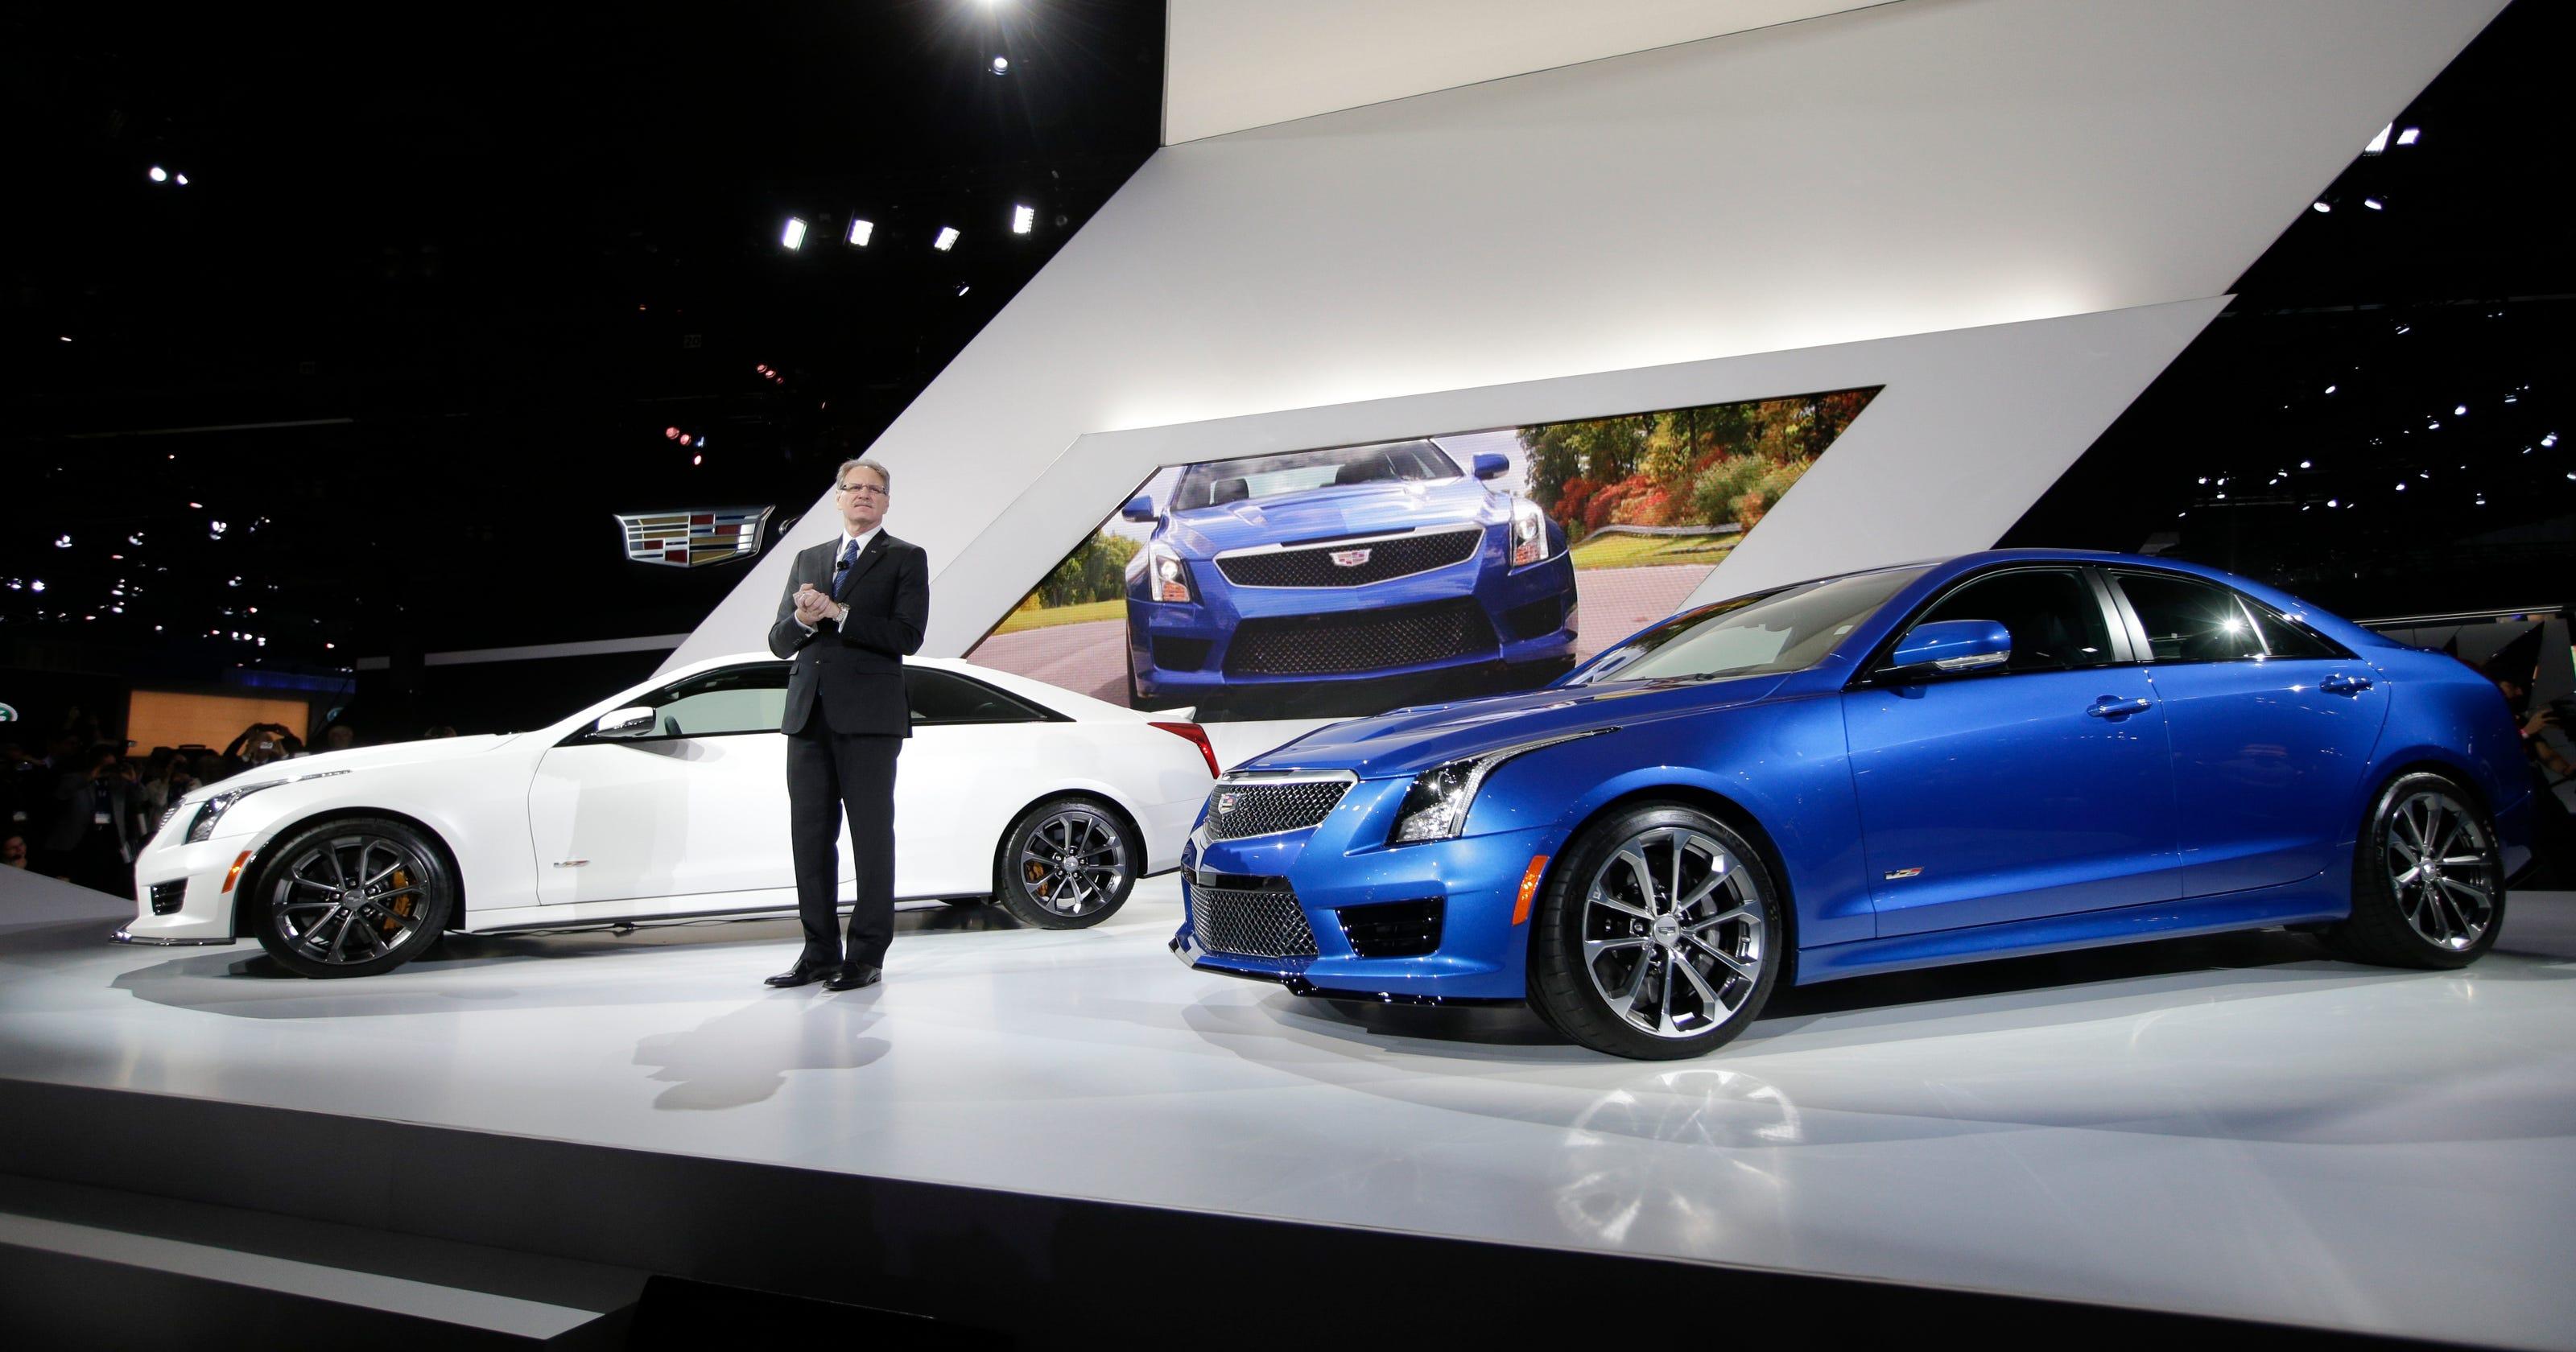 Cadillac Good Cars Bad Sales Whats The Fix